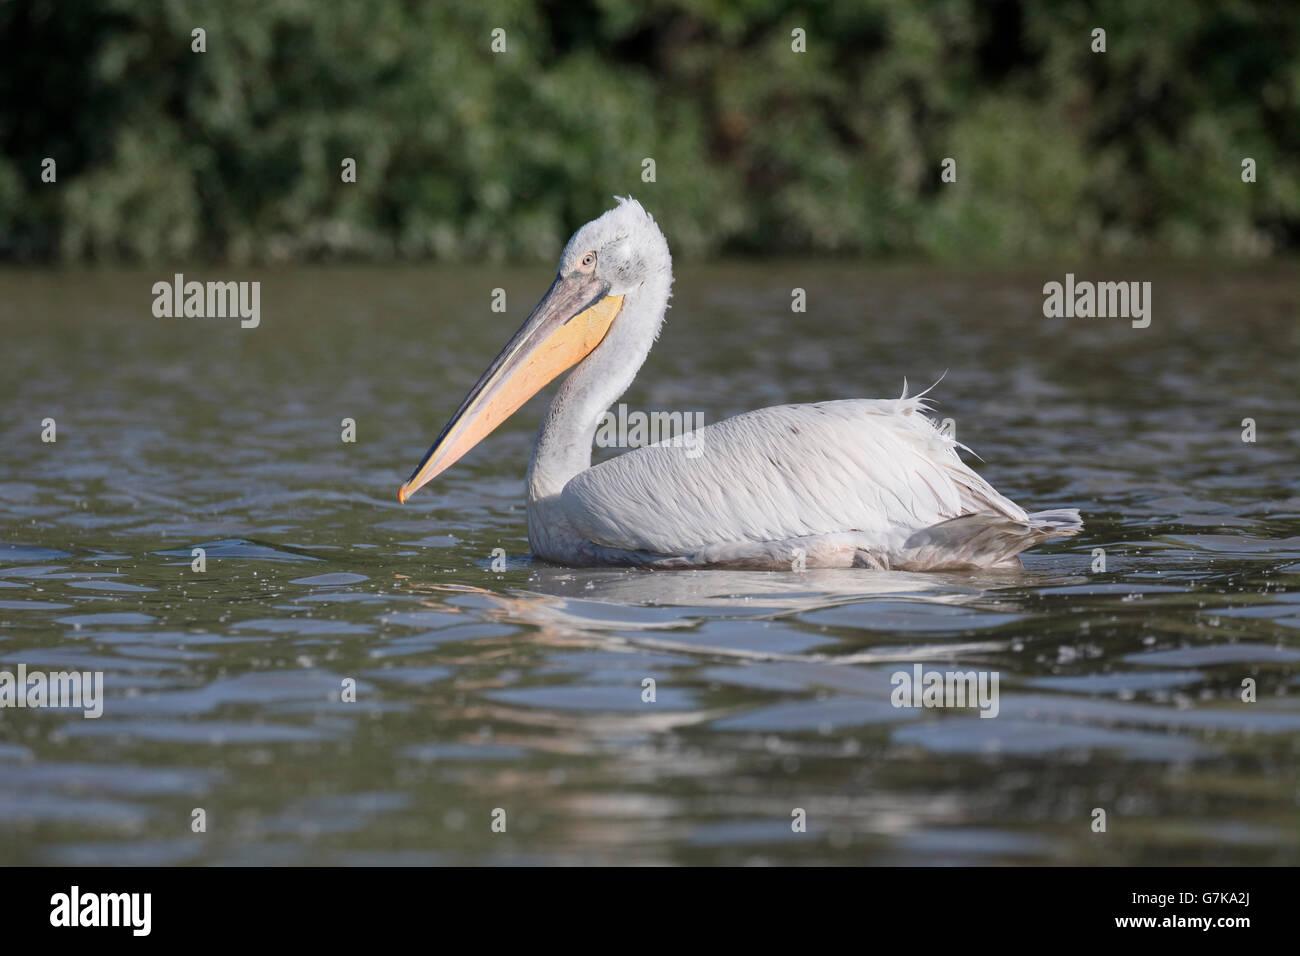 Dalmatian pelican, Pelecanus crispus, single bird on water,   Romania, June 2016 - Stock Image